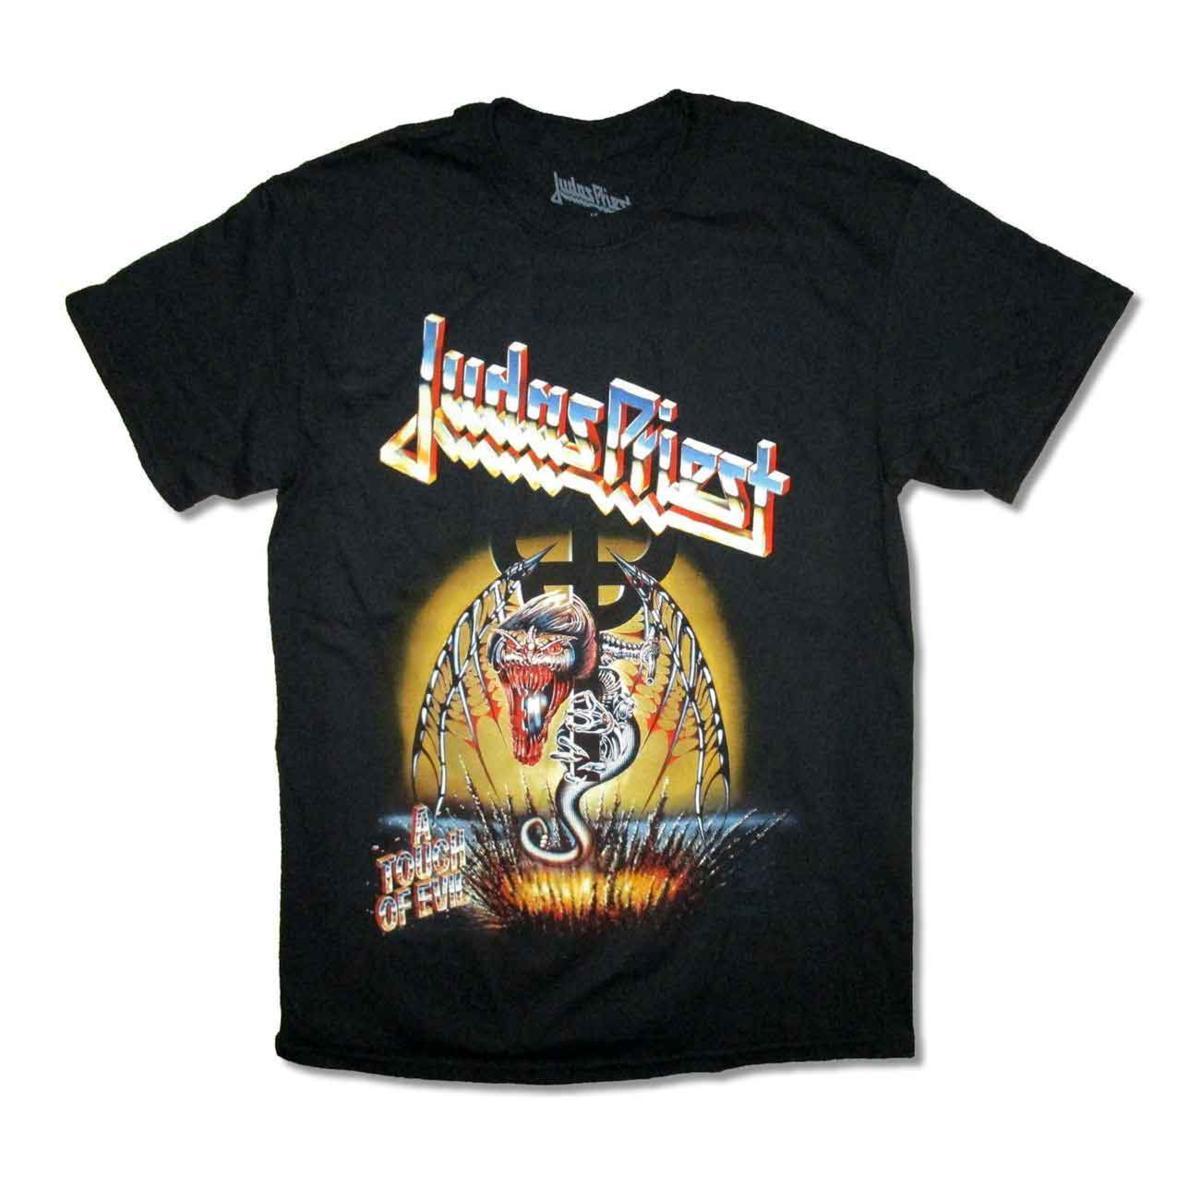 Judas Priest バンドTシャツ ジューダス・プリースト A Touch Of Evil M